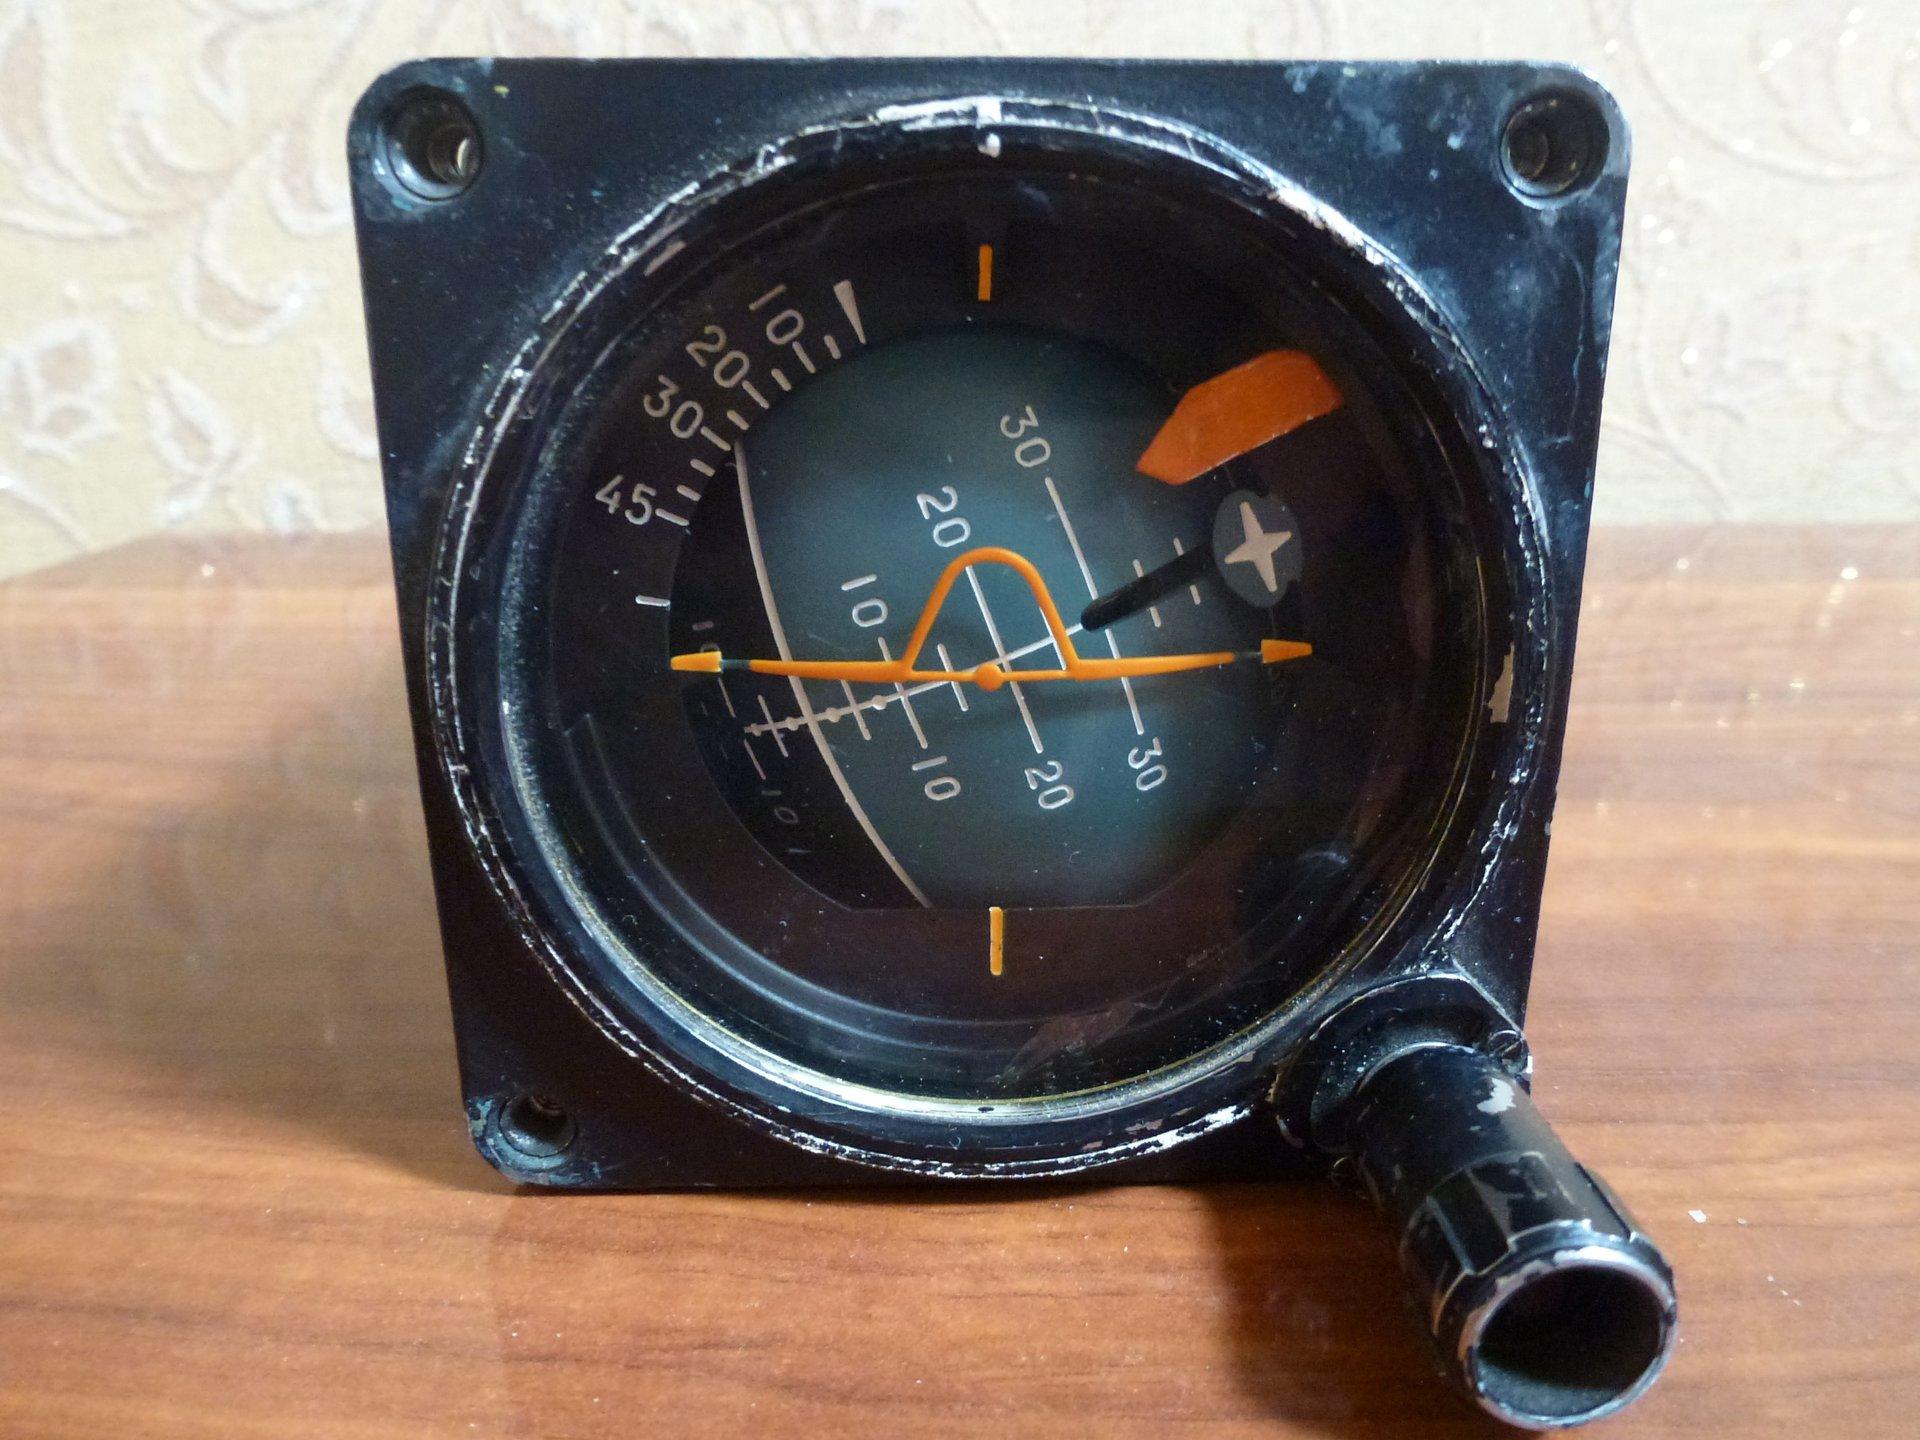 P1150276.JPG